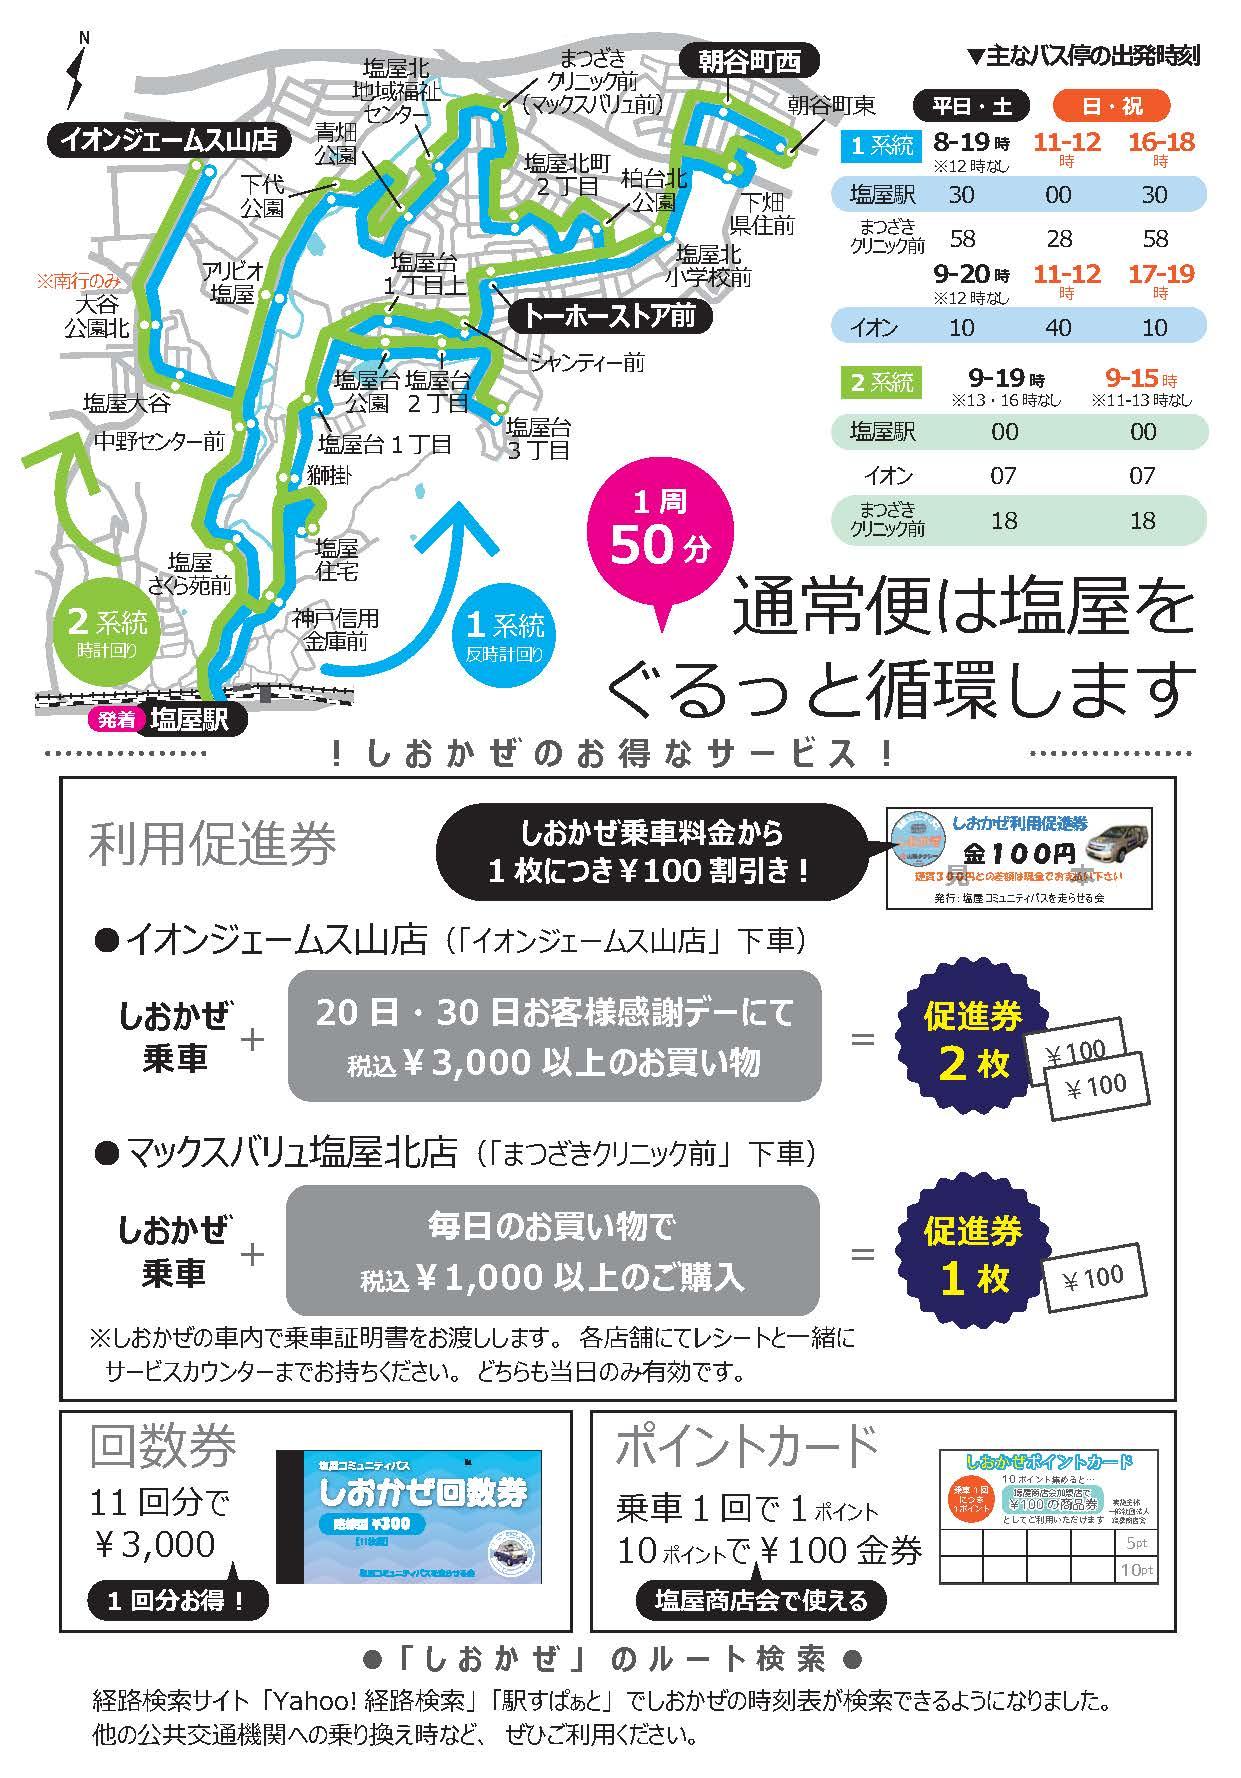 201707bus15_02.jpg